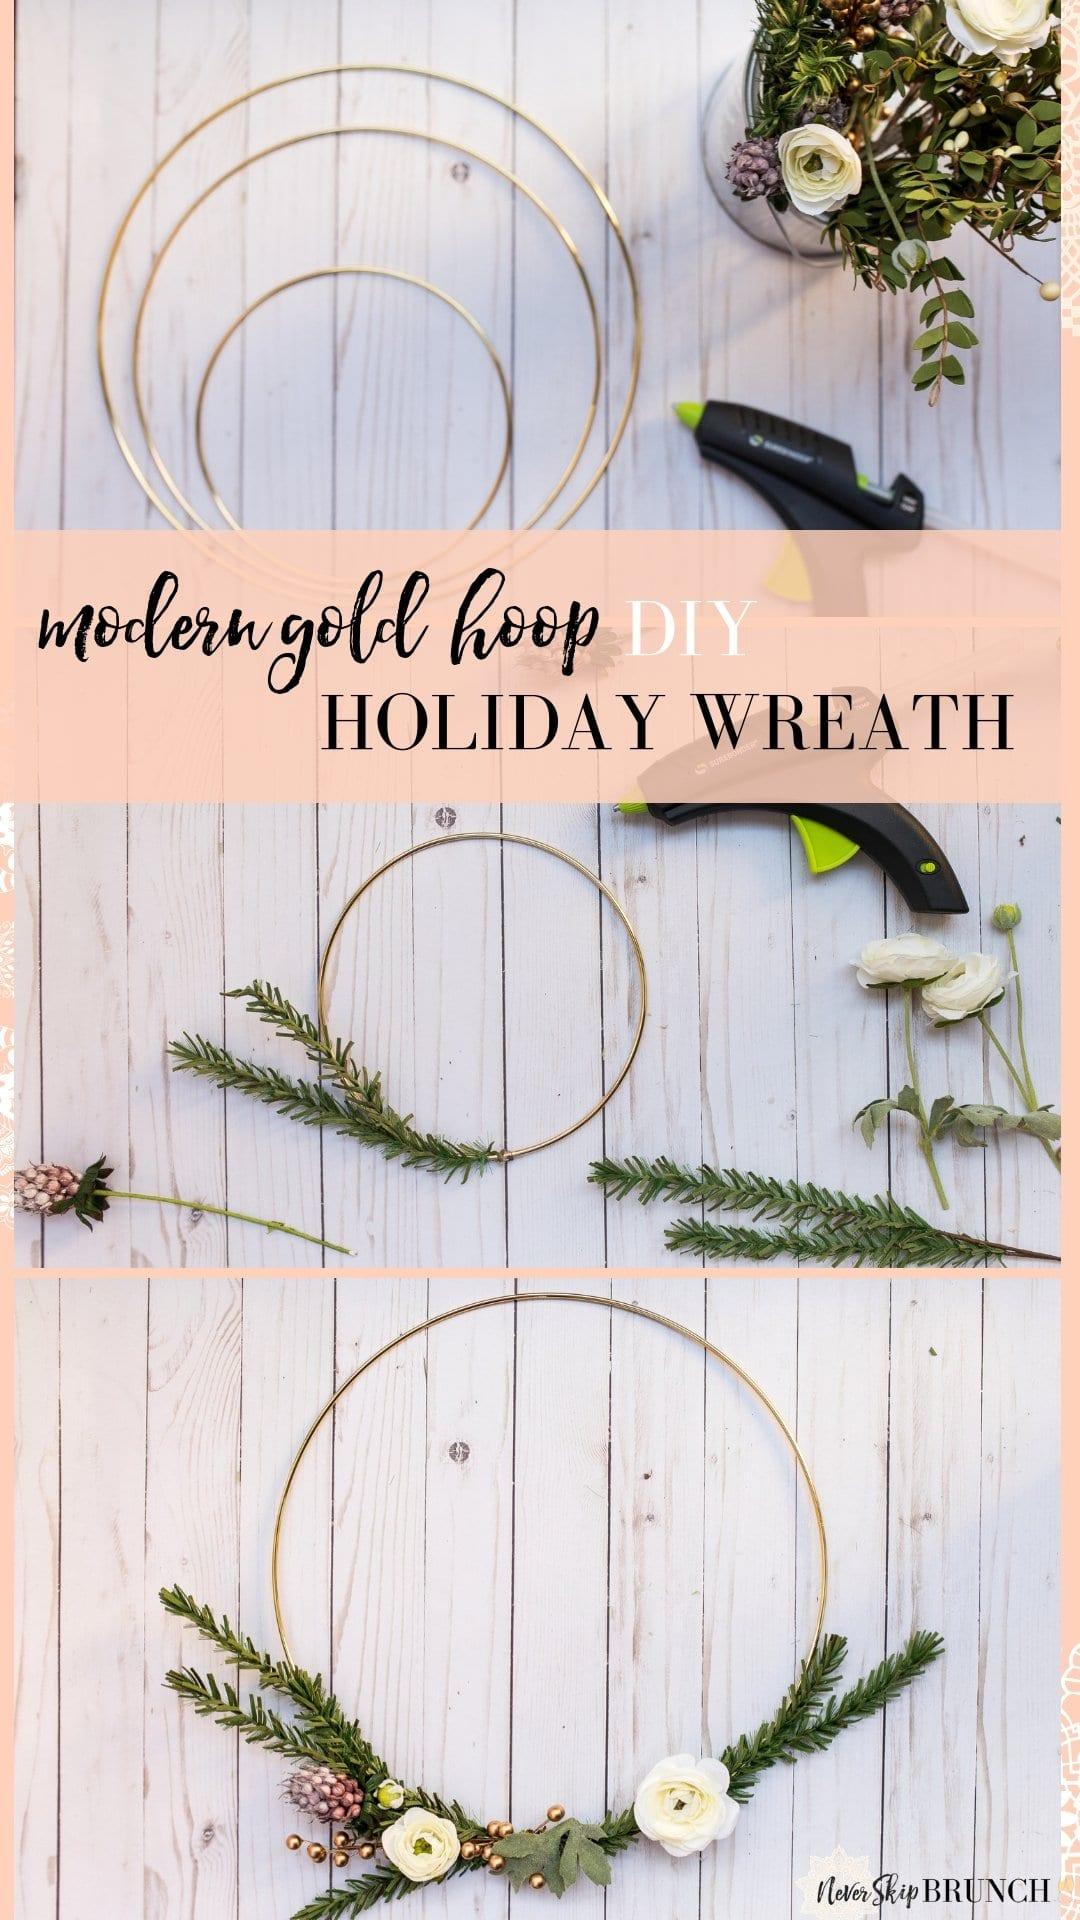 holiday wreaths diy christmas | christmas wreath gold hoop | how to make simple christmas wreath | christmas decor modern simple | holiday wreaths diy christmas simple | never skip brunch by cara newhart #decor #christmas #holiday